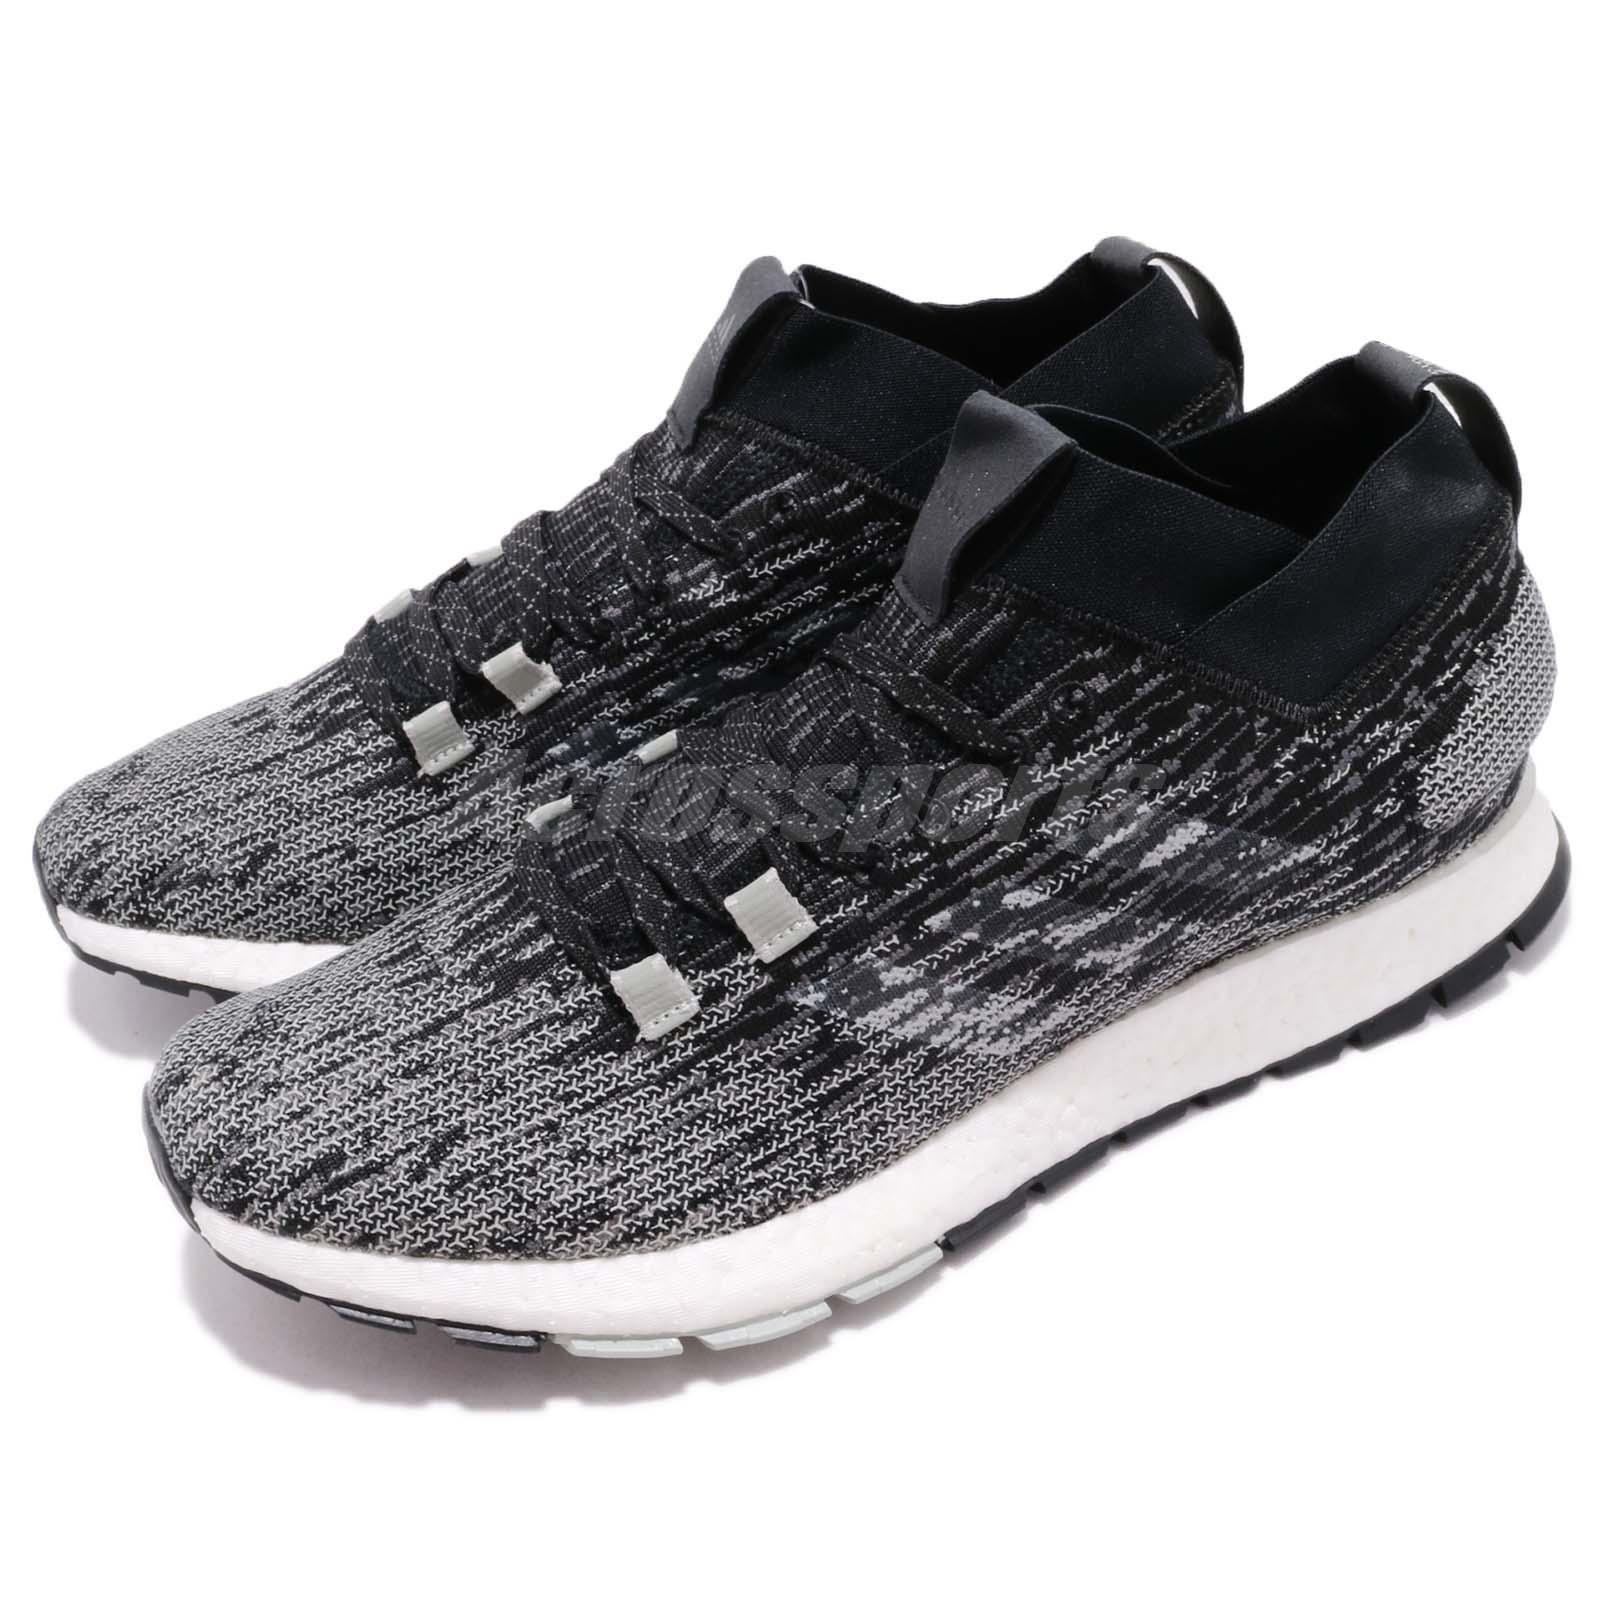 f526de15102 adidas PureBOOST RBL LTD Black Grey Silver Men Running Shoes ...